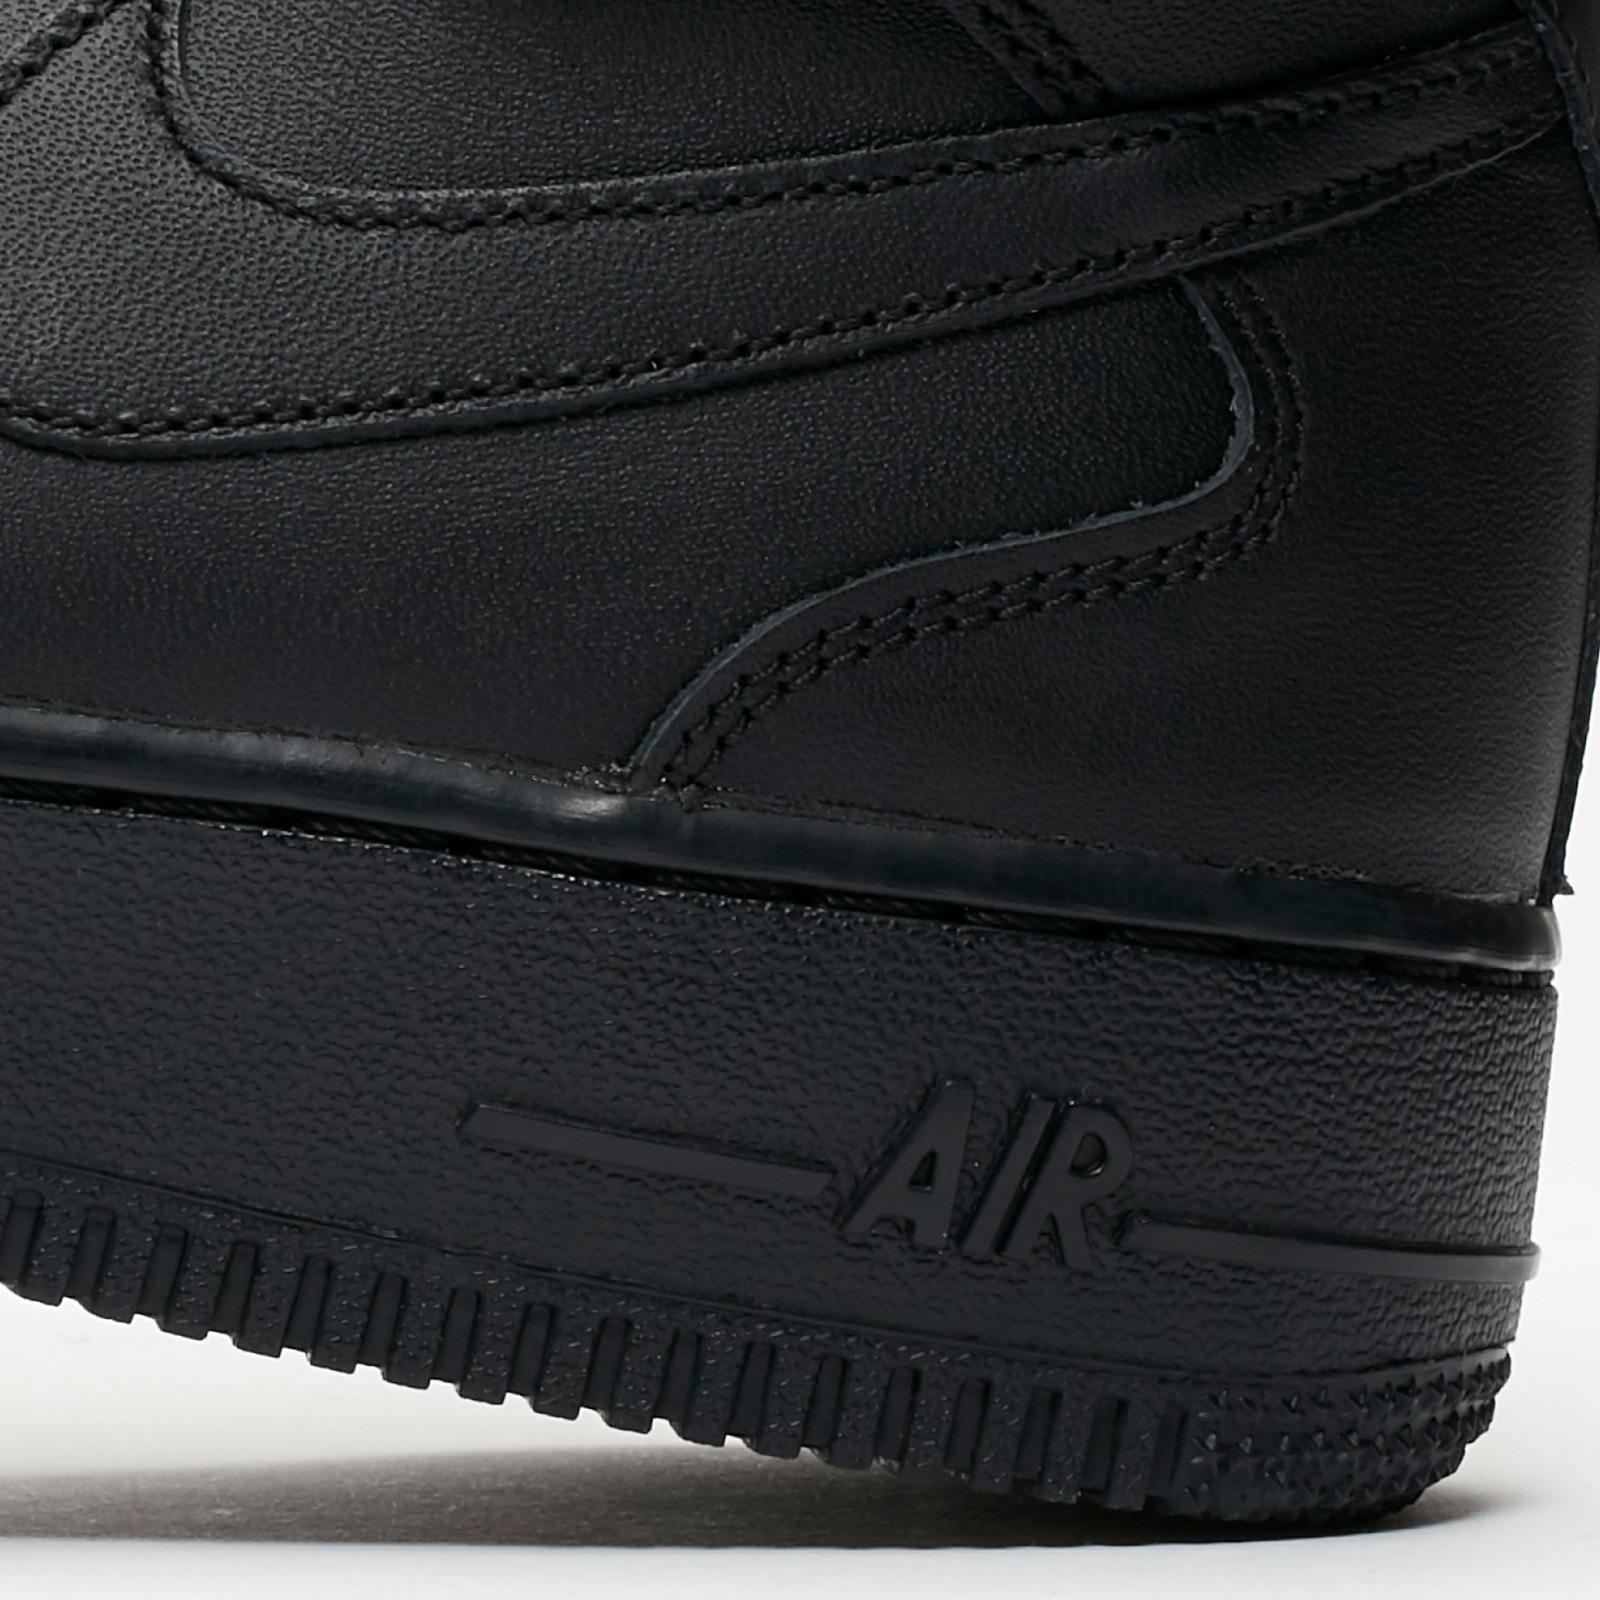 Frotar Lamer caja registradora  Nike Wmns Air Force 1 Mid 07 LE - 366731-001 - Sneakersnstuff | sneakers &  streetwear online since 1999